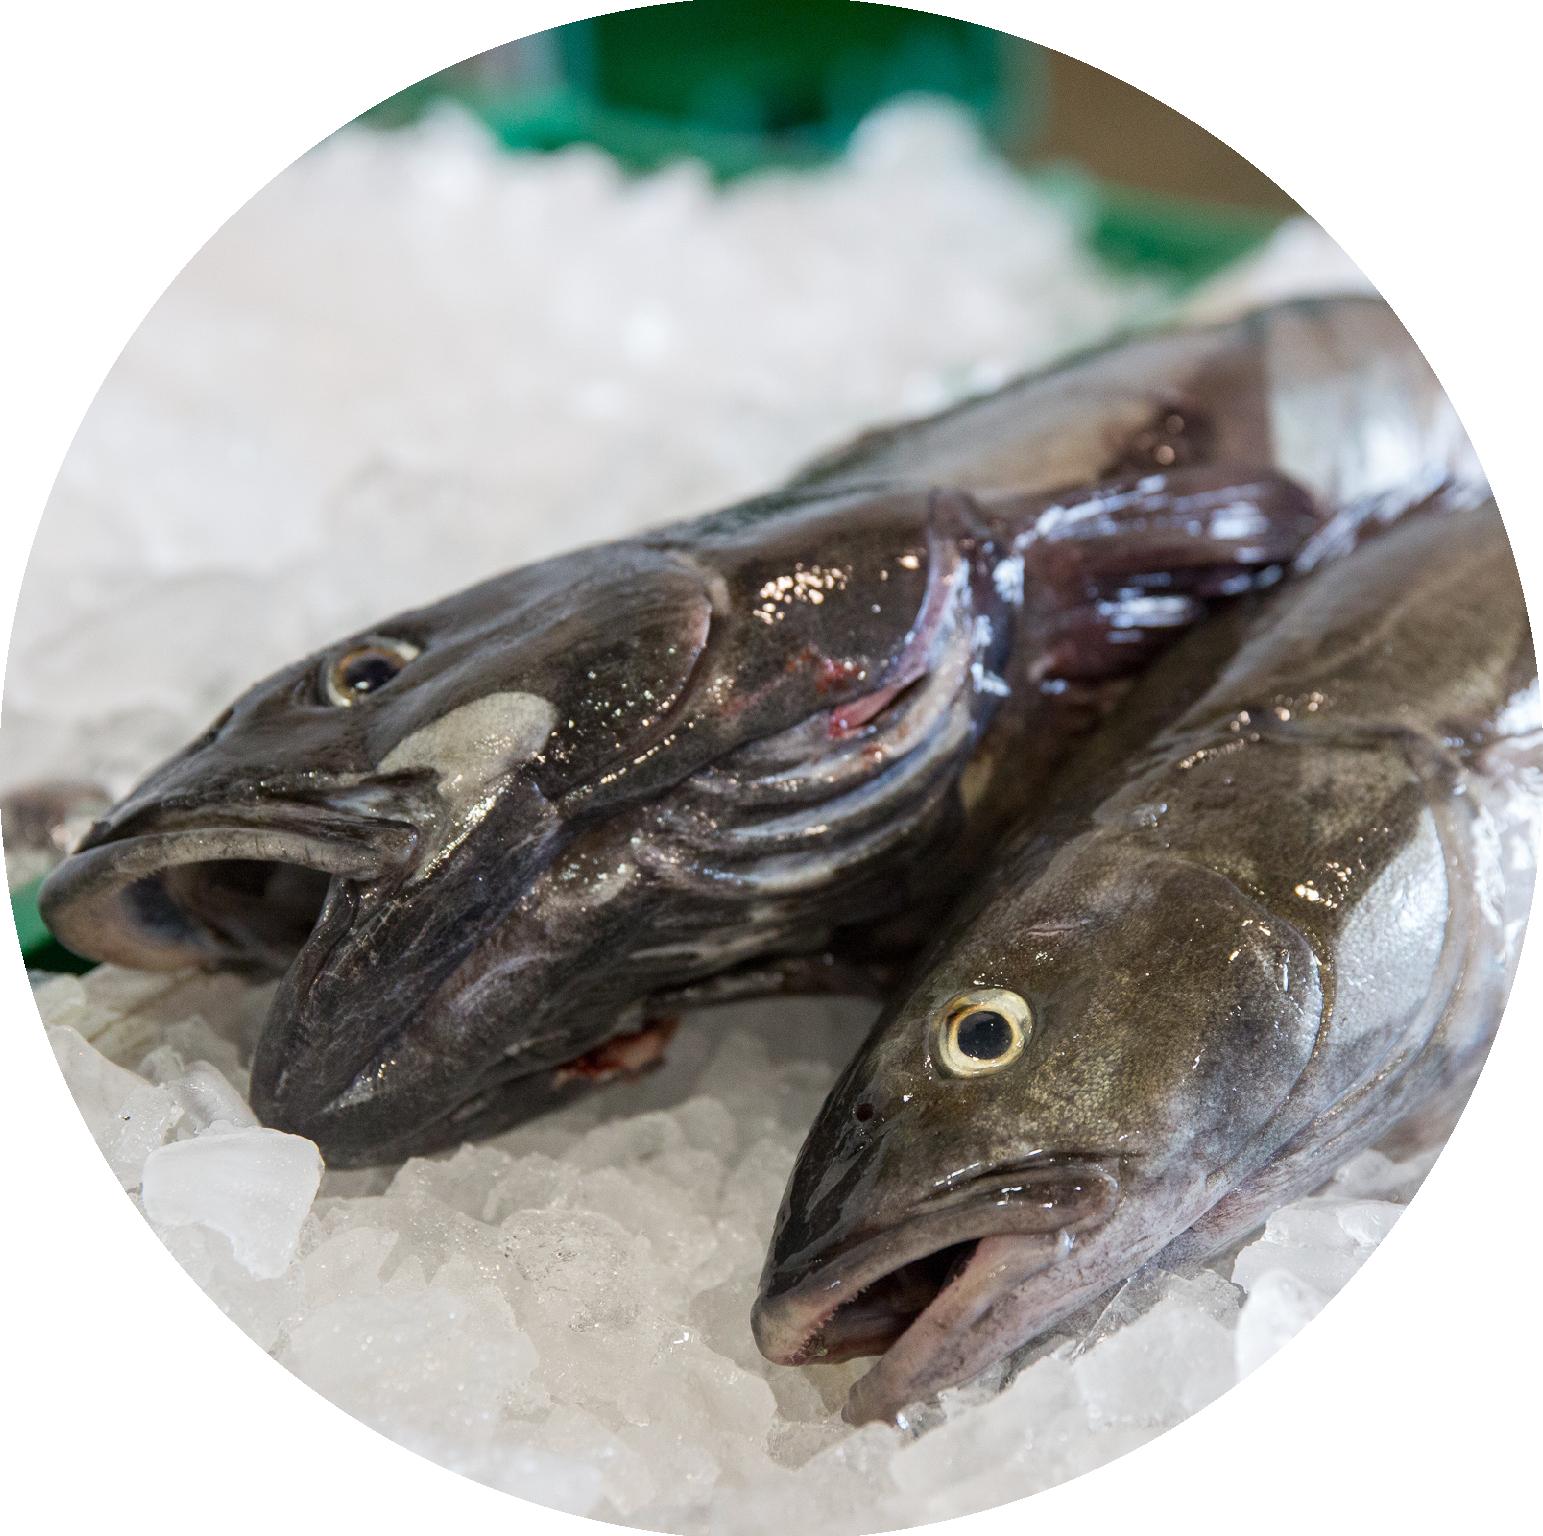 SABLEFISH - AKA Black cod